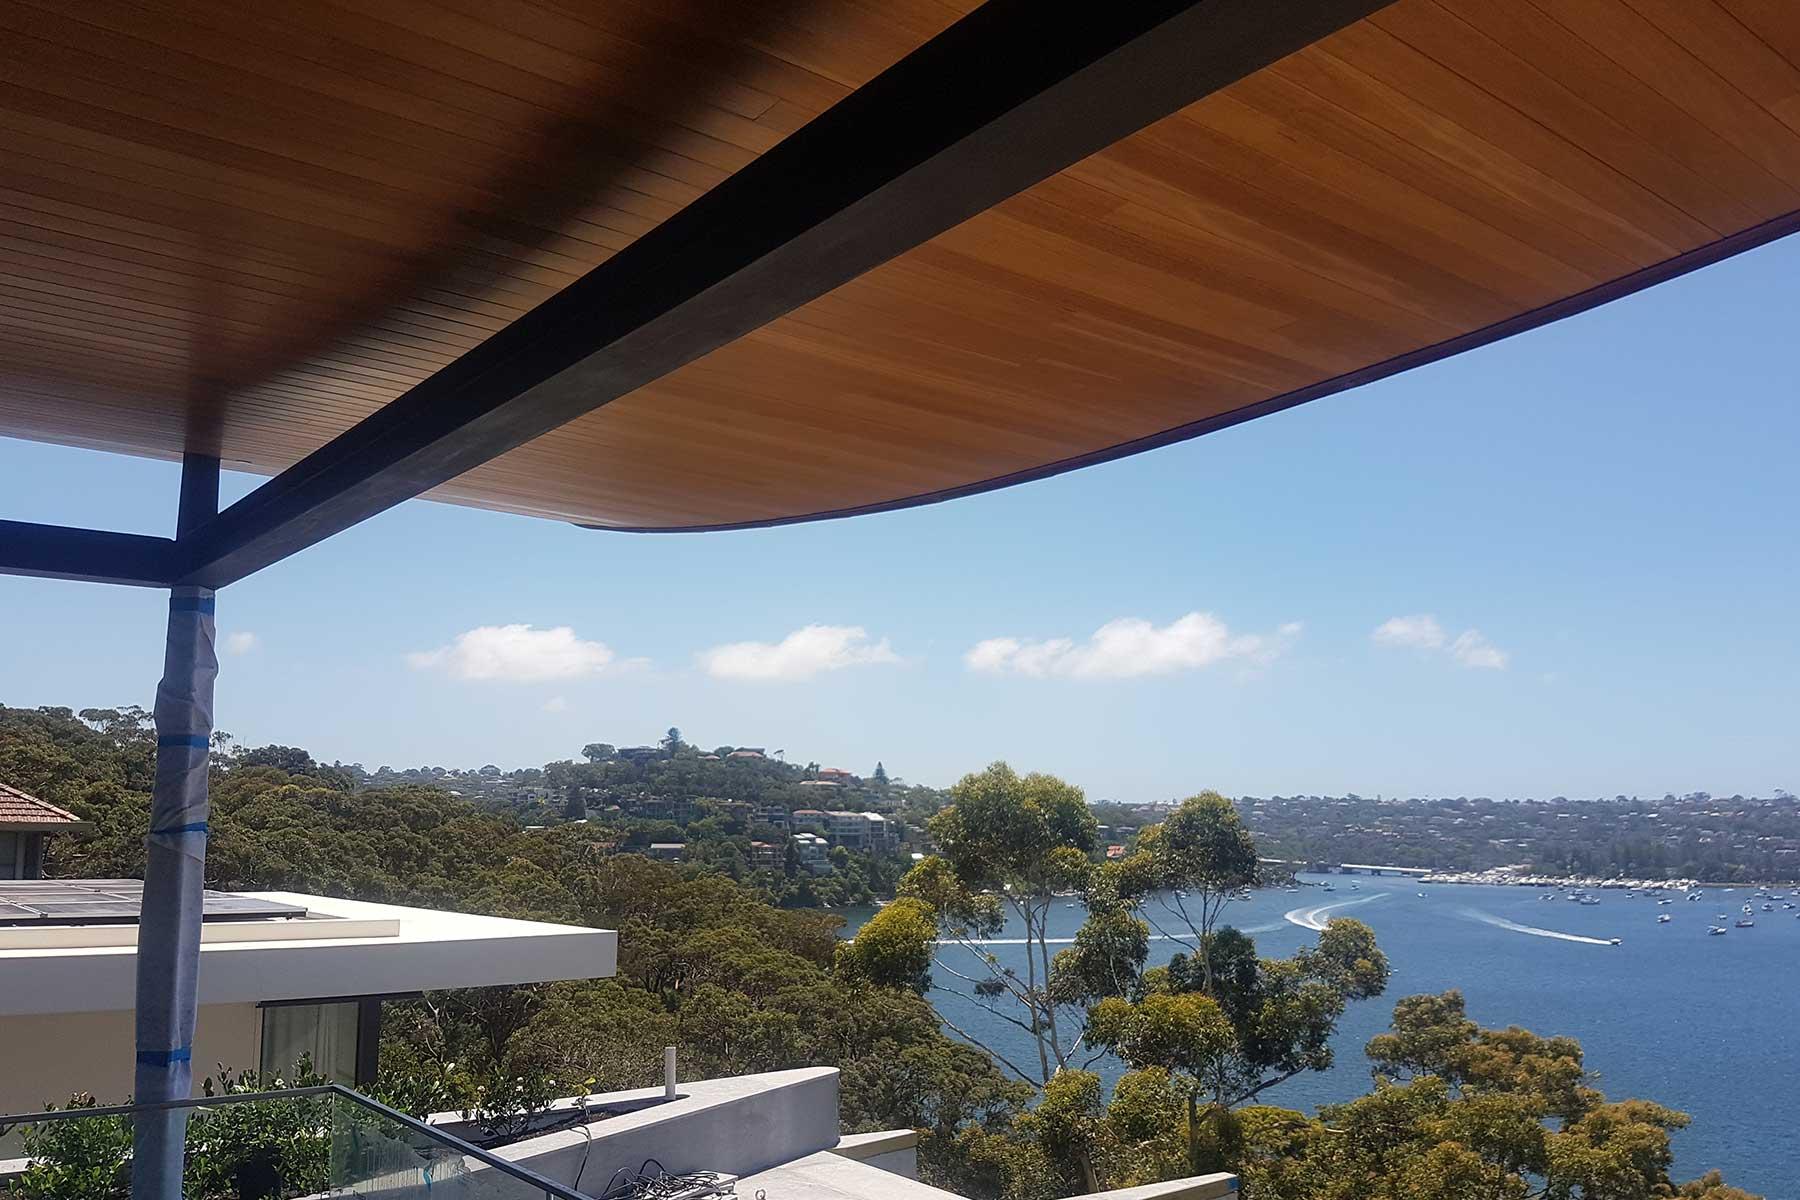 Blue-Zinc-Constructions-Timber-Deck-Ceiling